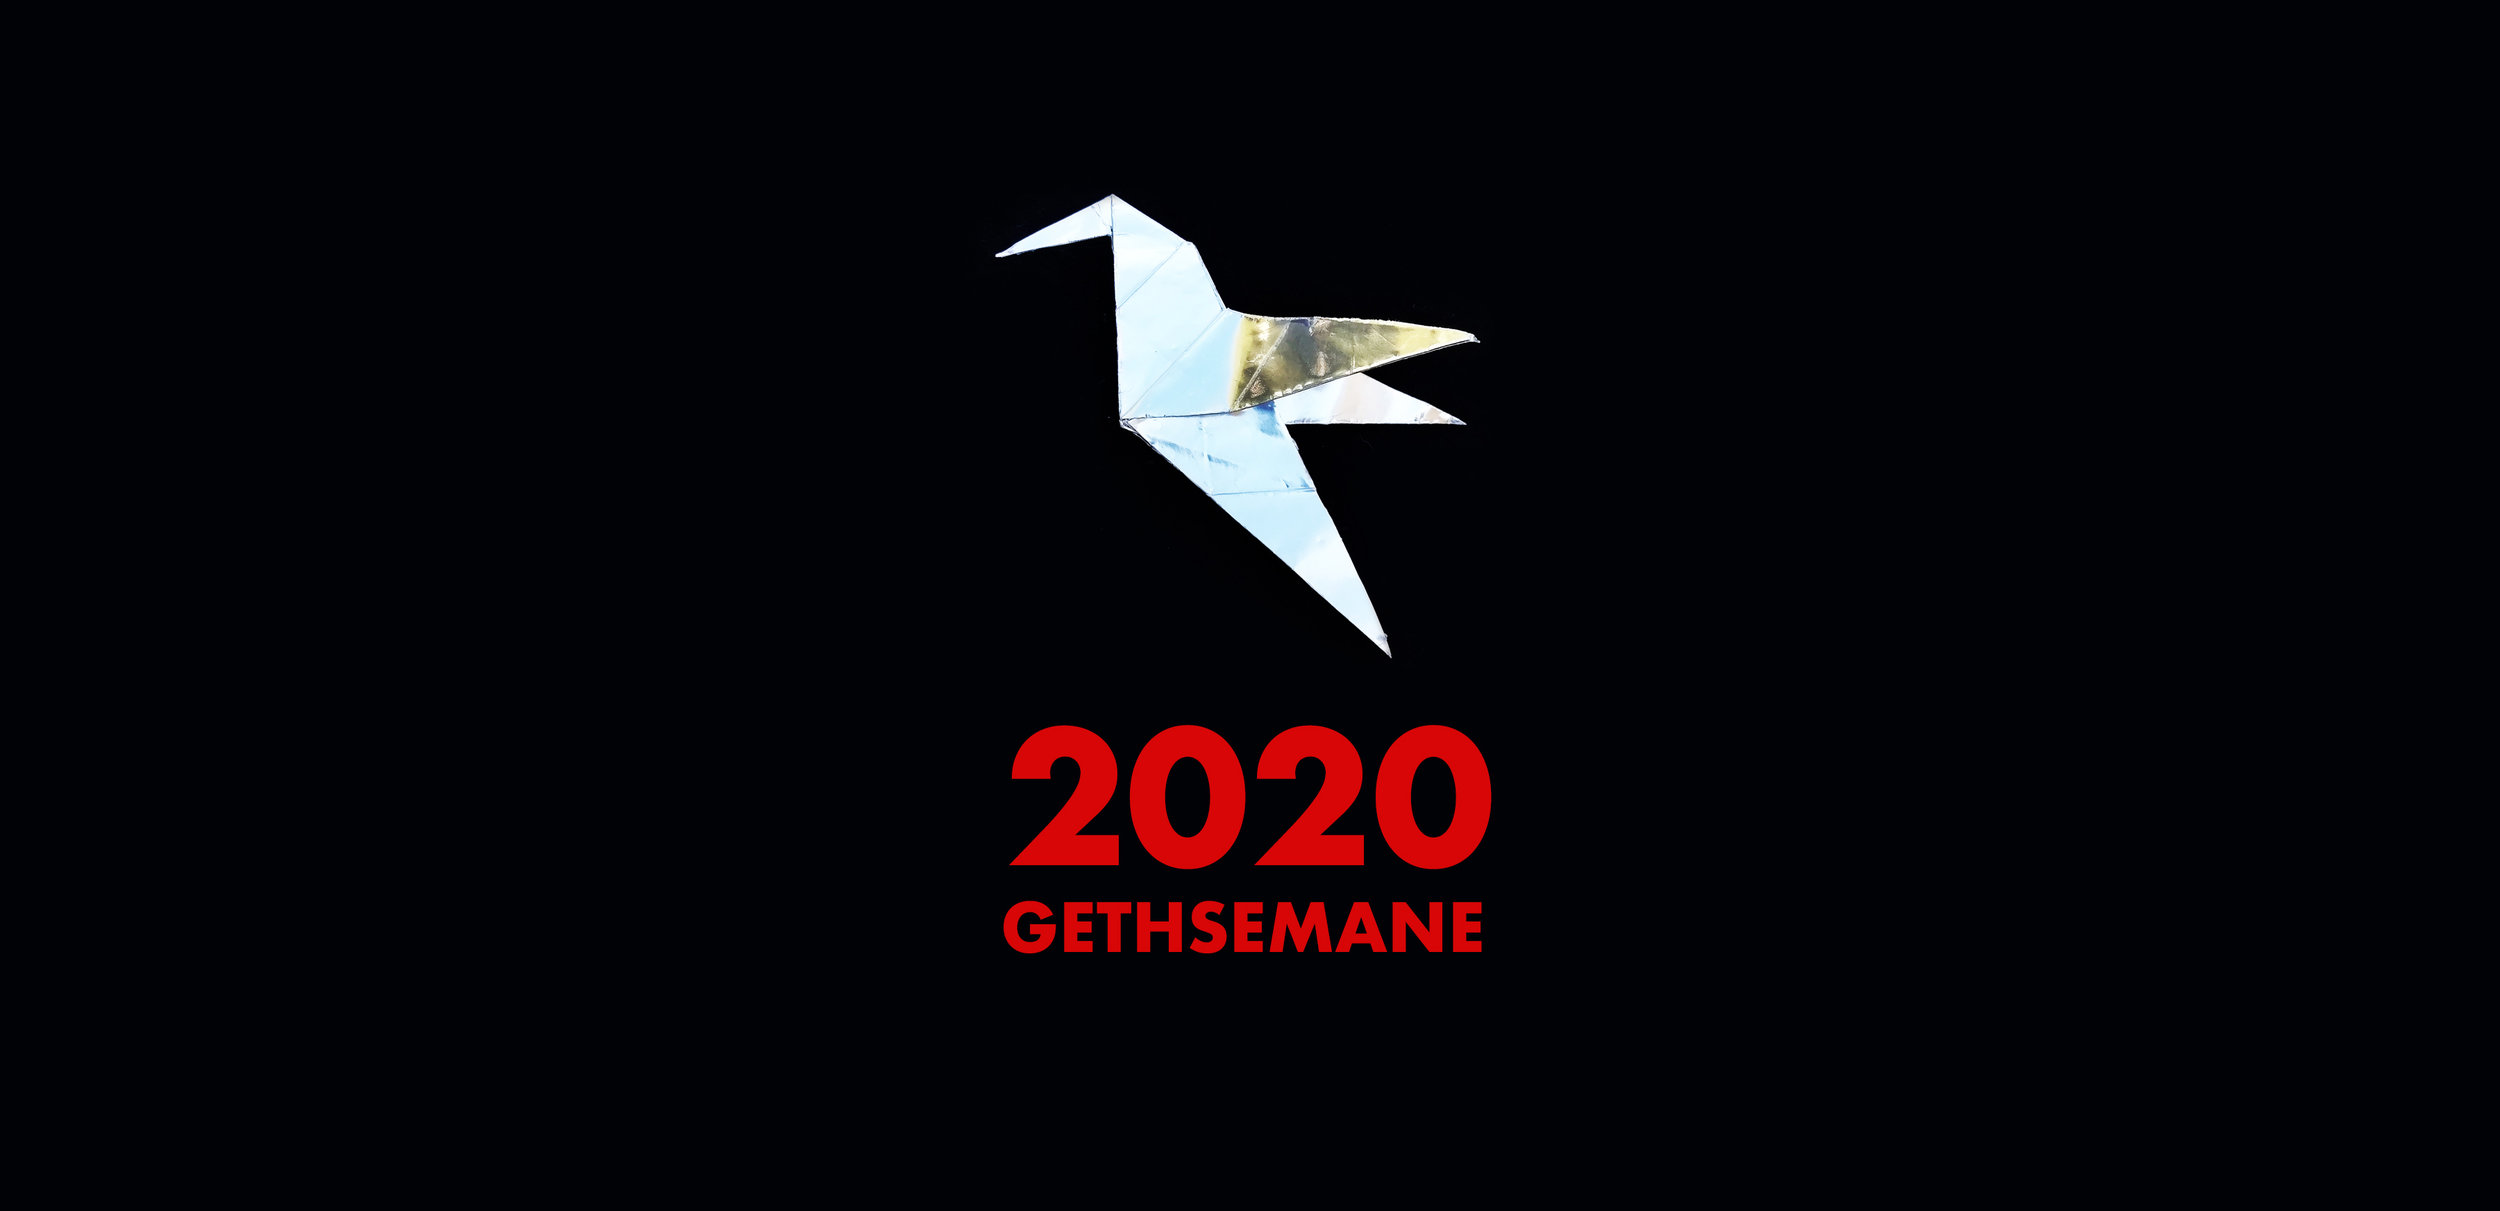 Gethsemane YouTube Cover.jpg